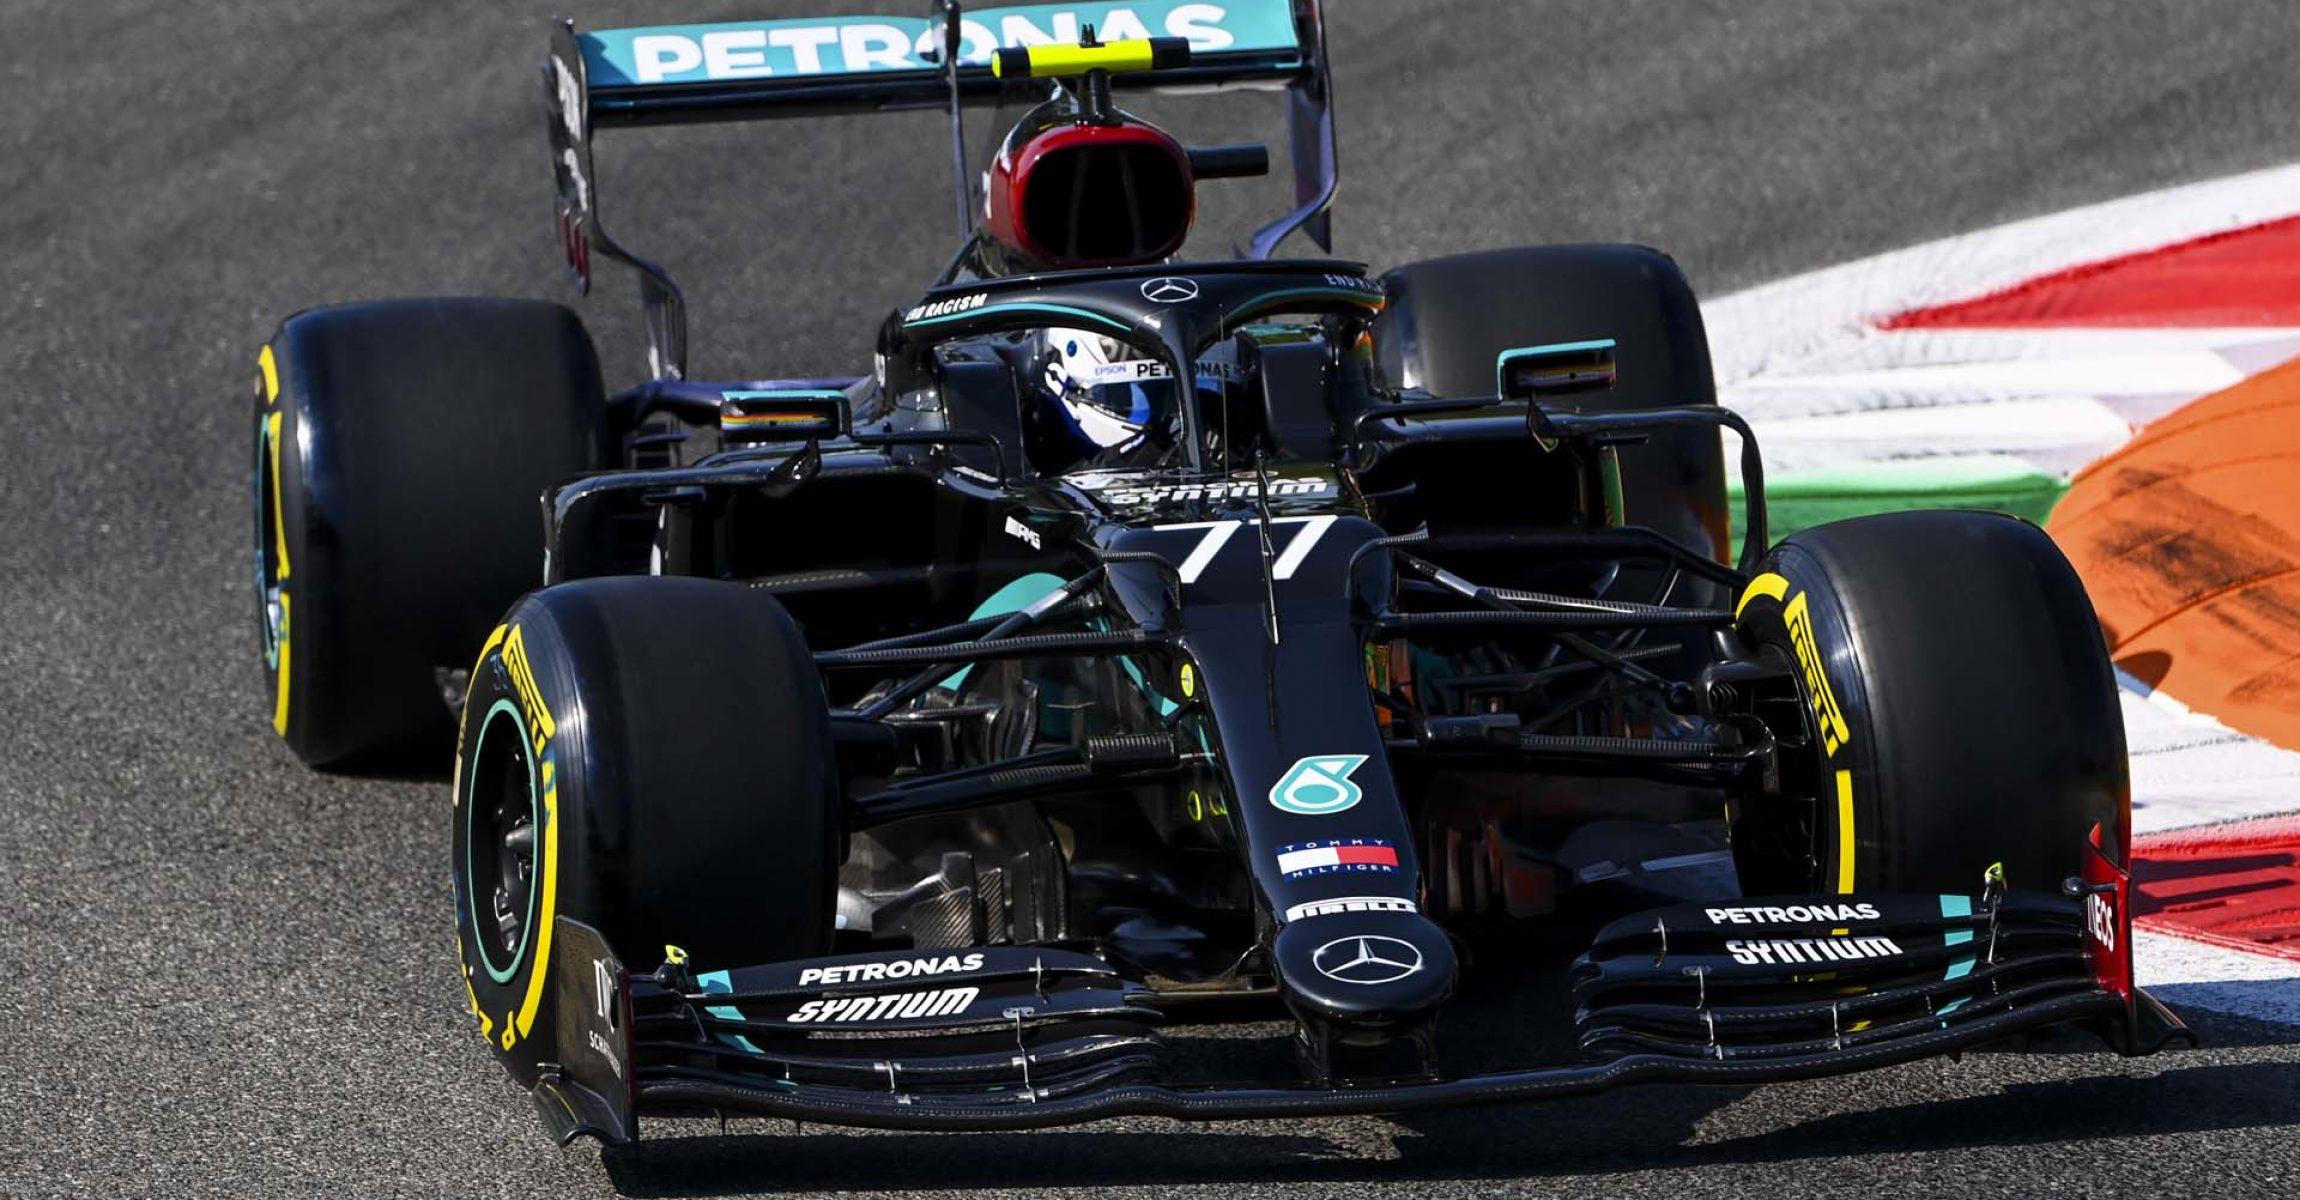 2020 Italian Grand Prix, Friday - LAT Images Valtteri Bottas Mercedes